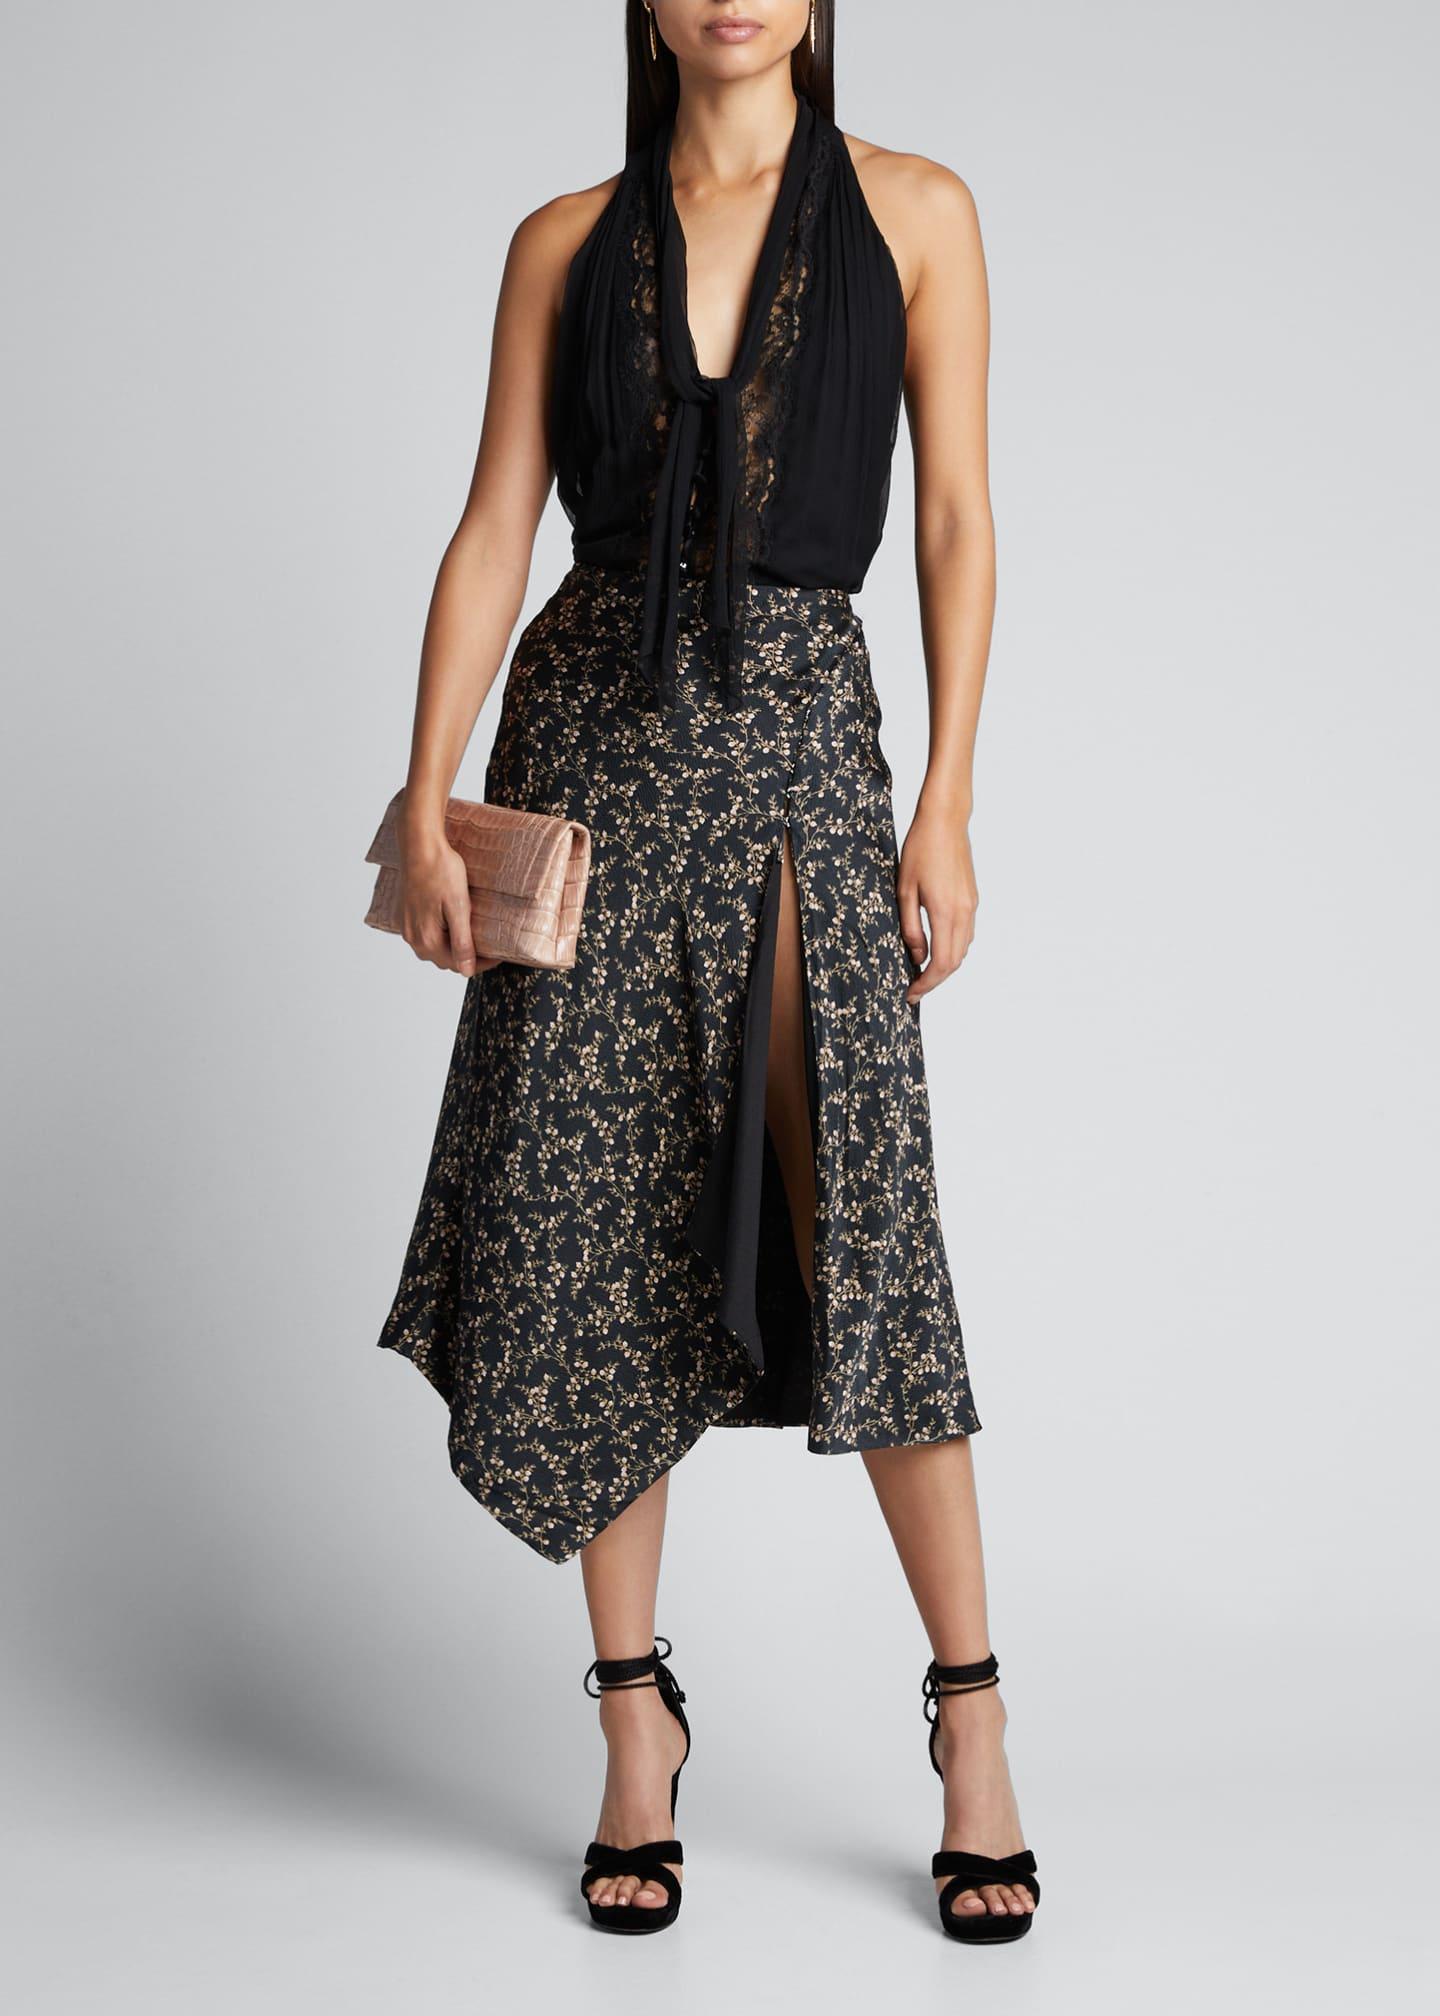 Jonathan Simkhai Collection Tie-Neck Lace Sleeveless Top